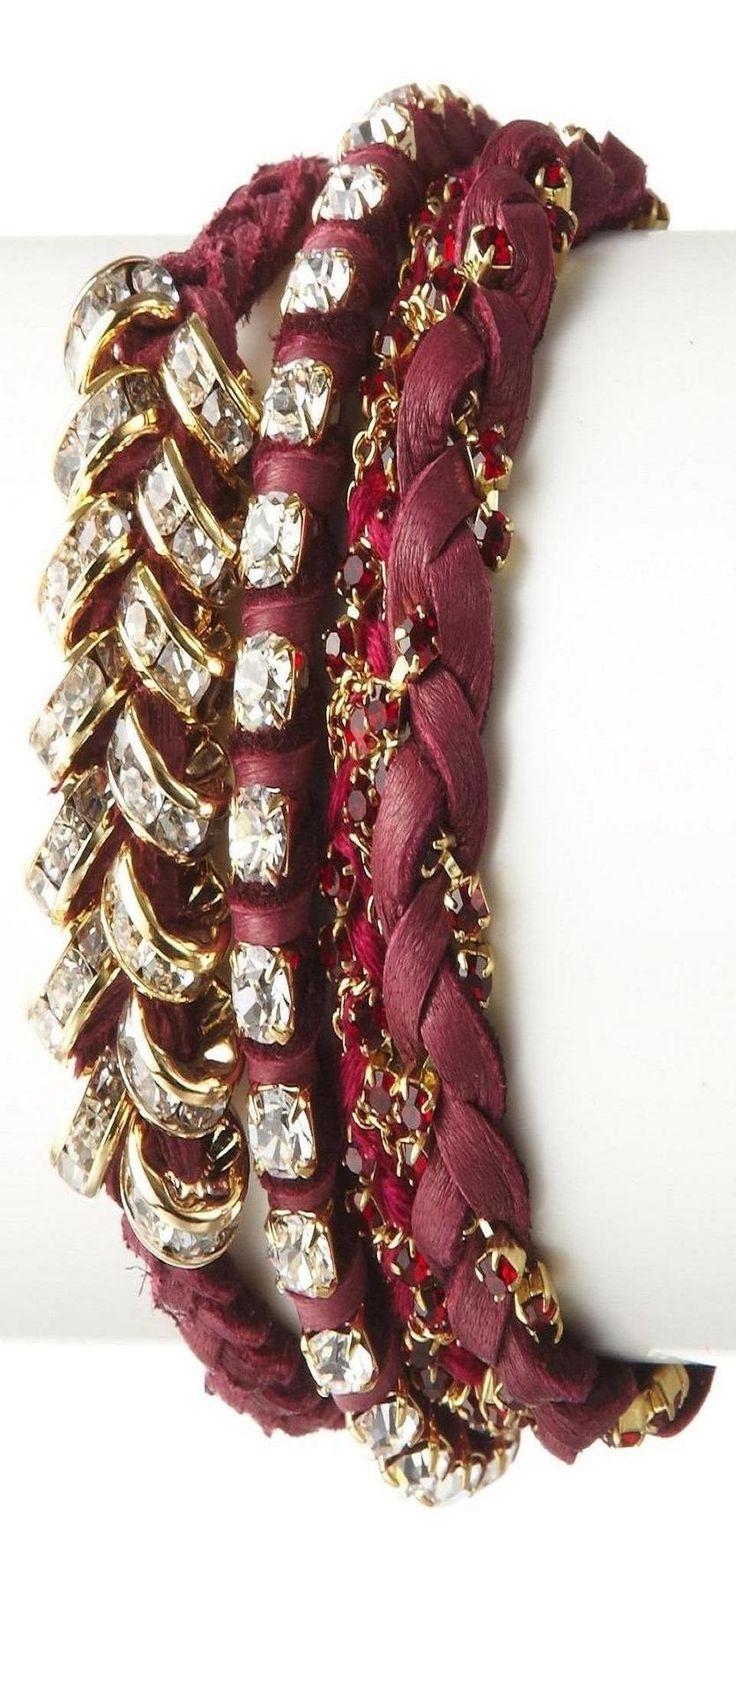 http://www.beadshop.com.br/?utm_source=pinterest&utm_medium=pint&partner=pin13 pulseira marsala  Ettika Plum Pantone 2015 Marsala Color